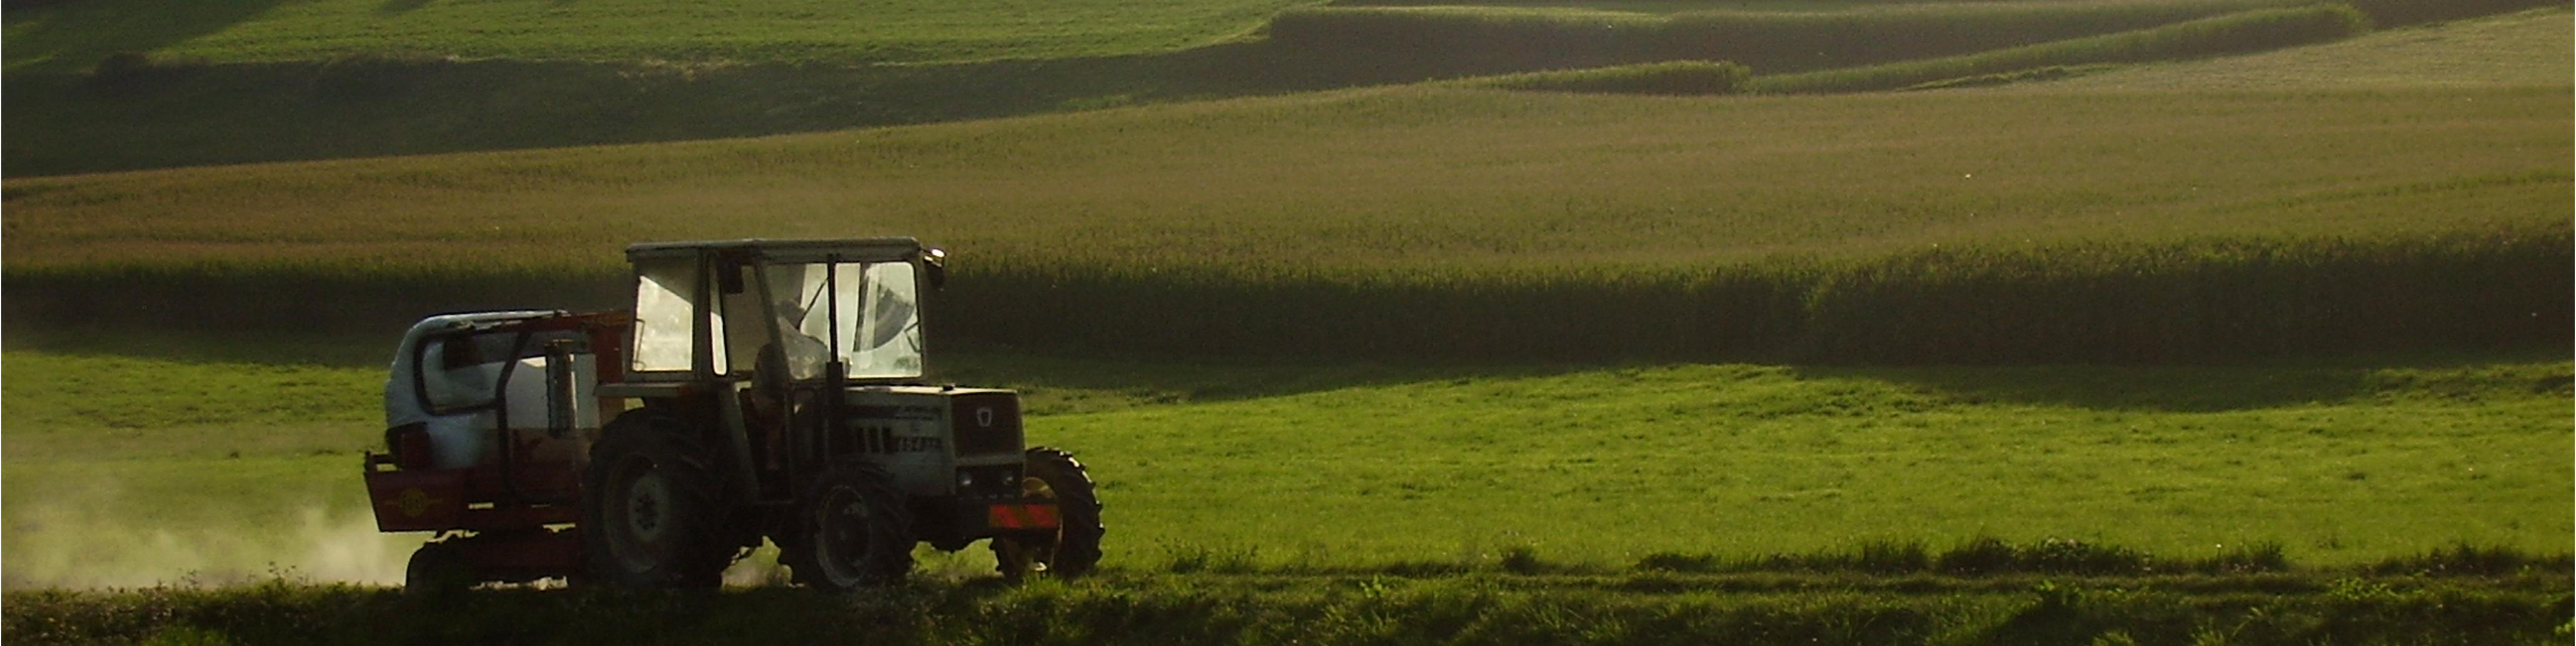 consulenza agronomica